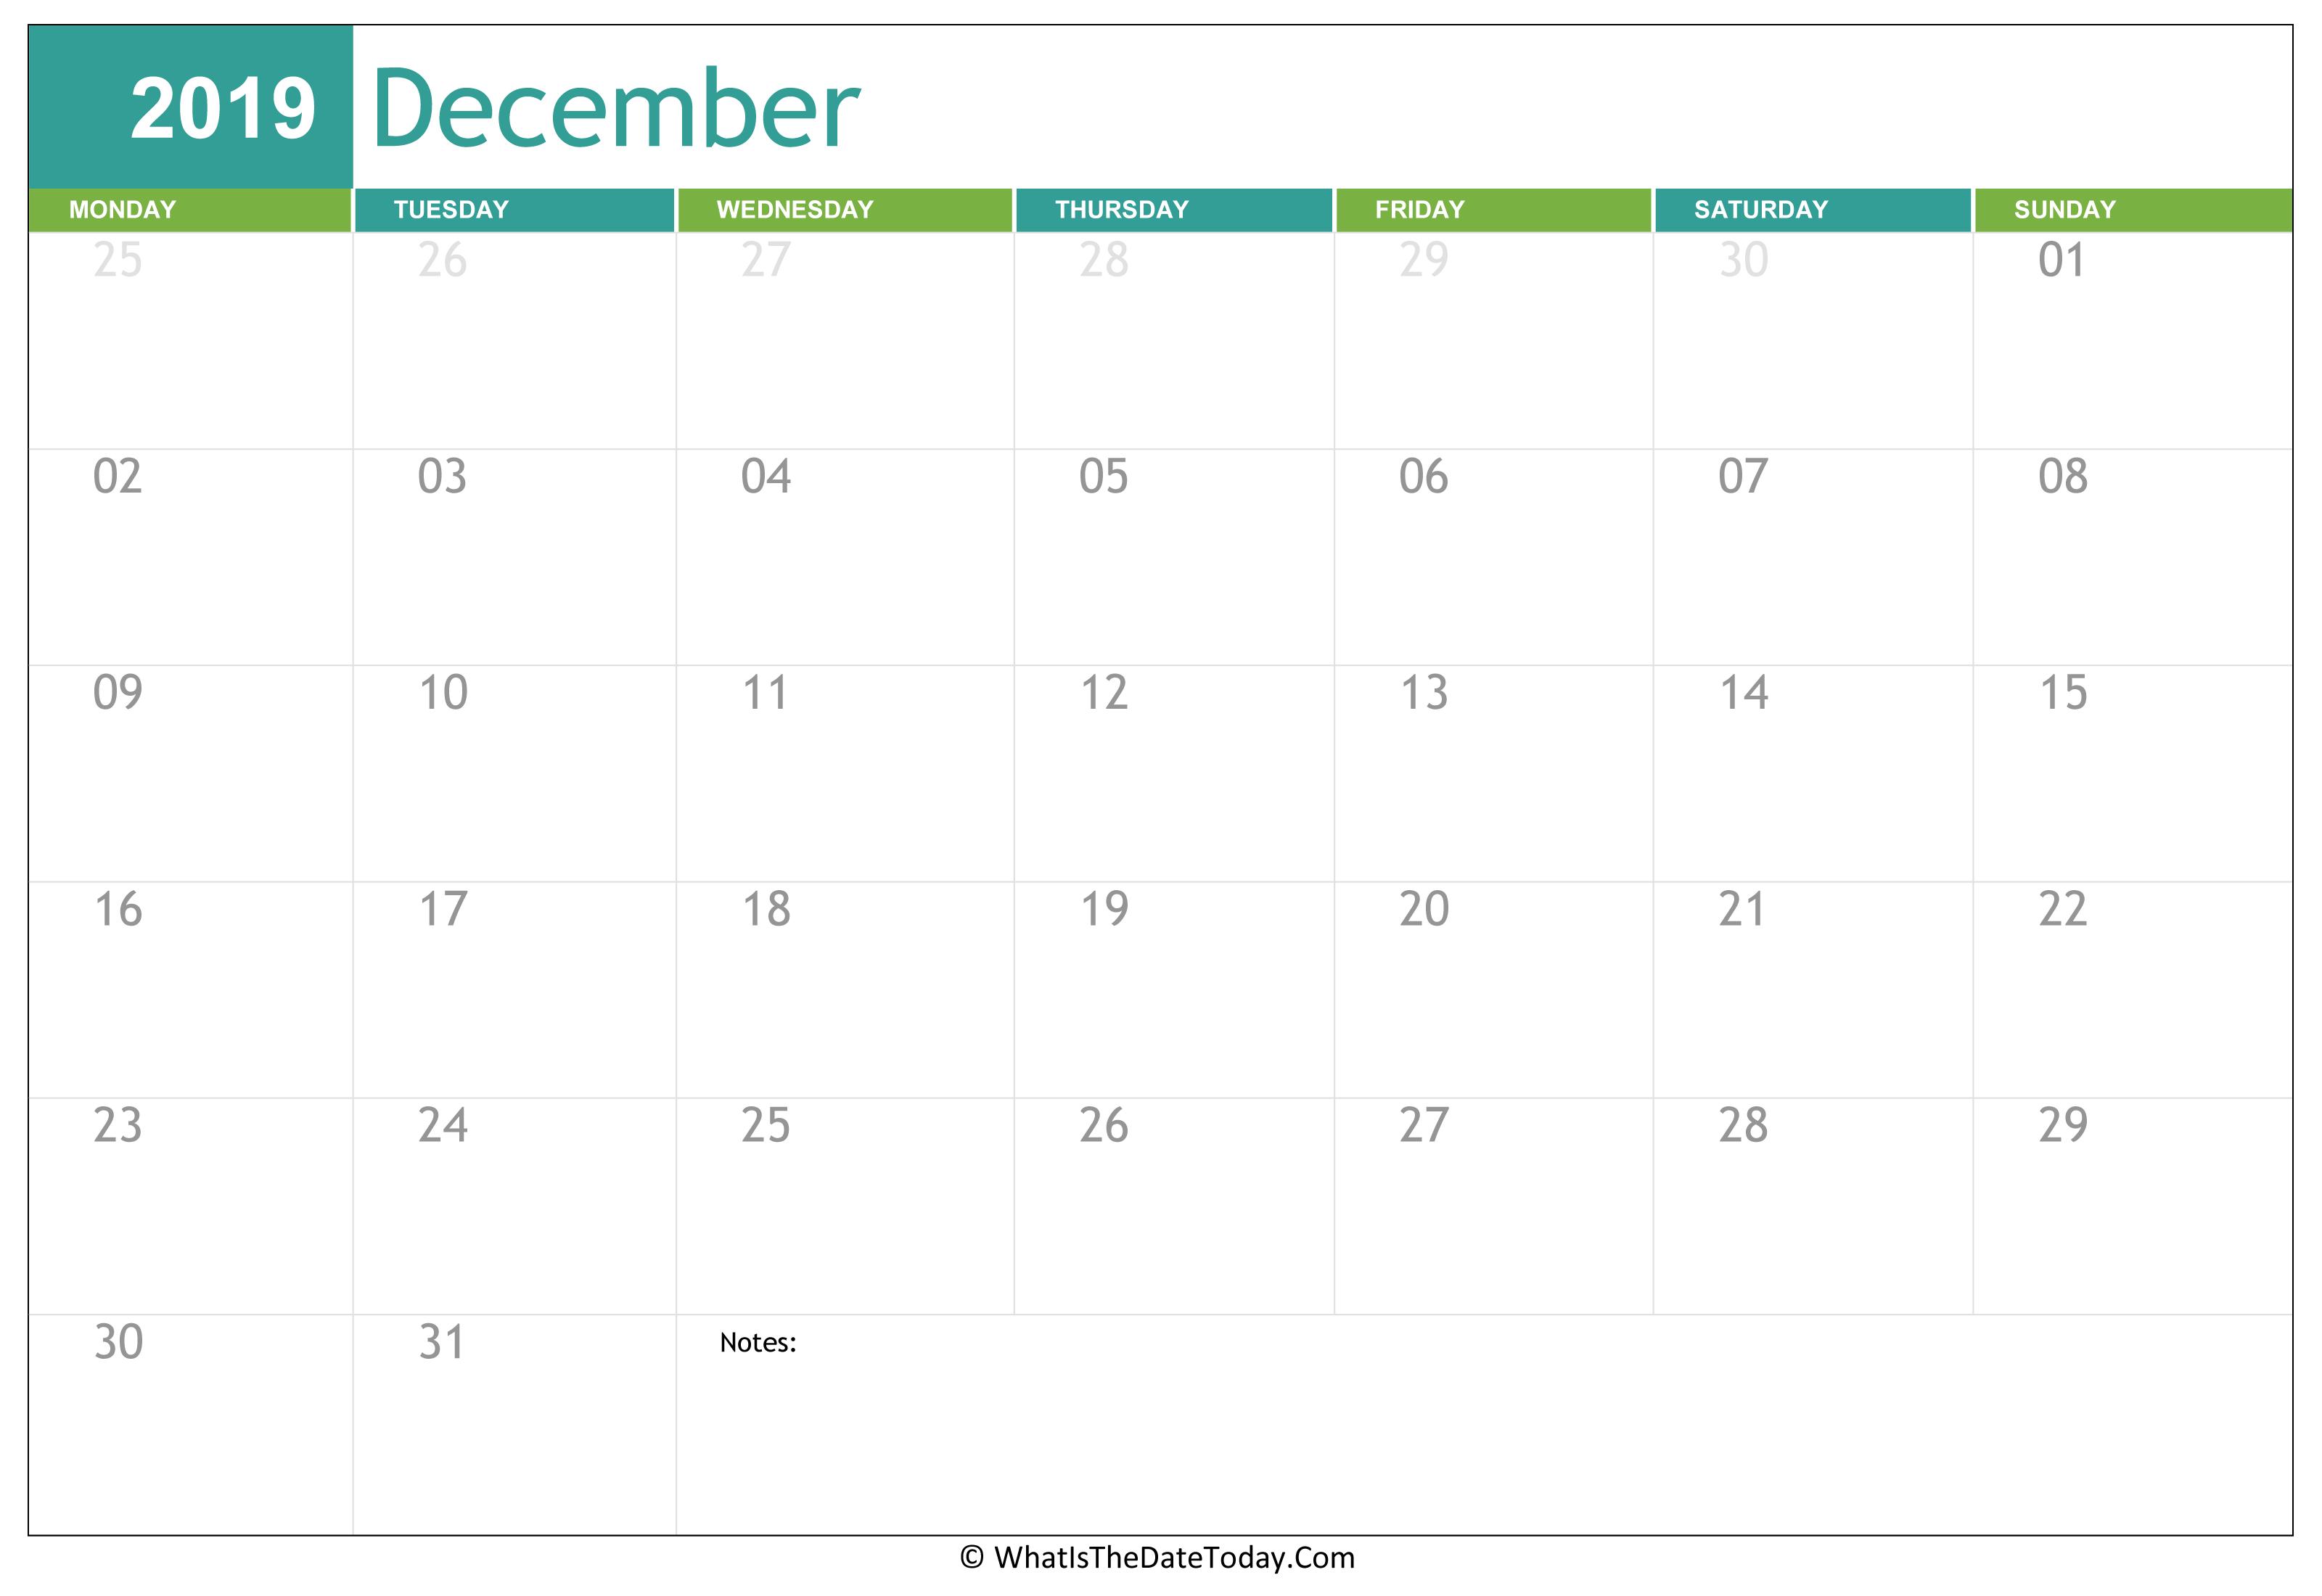 Fillable December Calendar 2019 | Whatisthedatetoday.Com